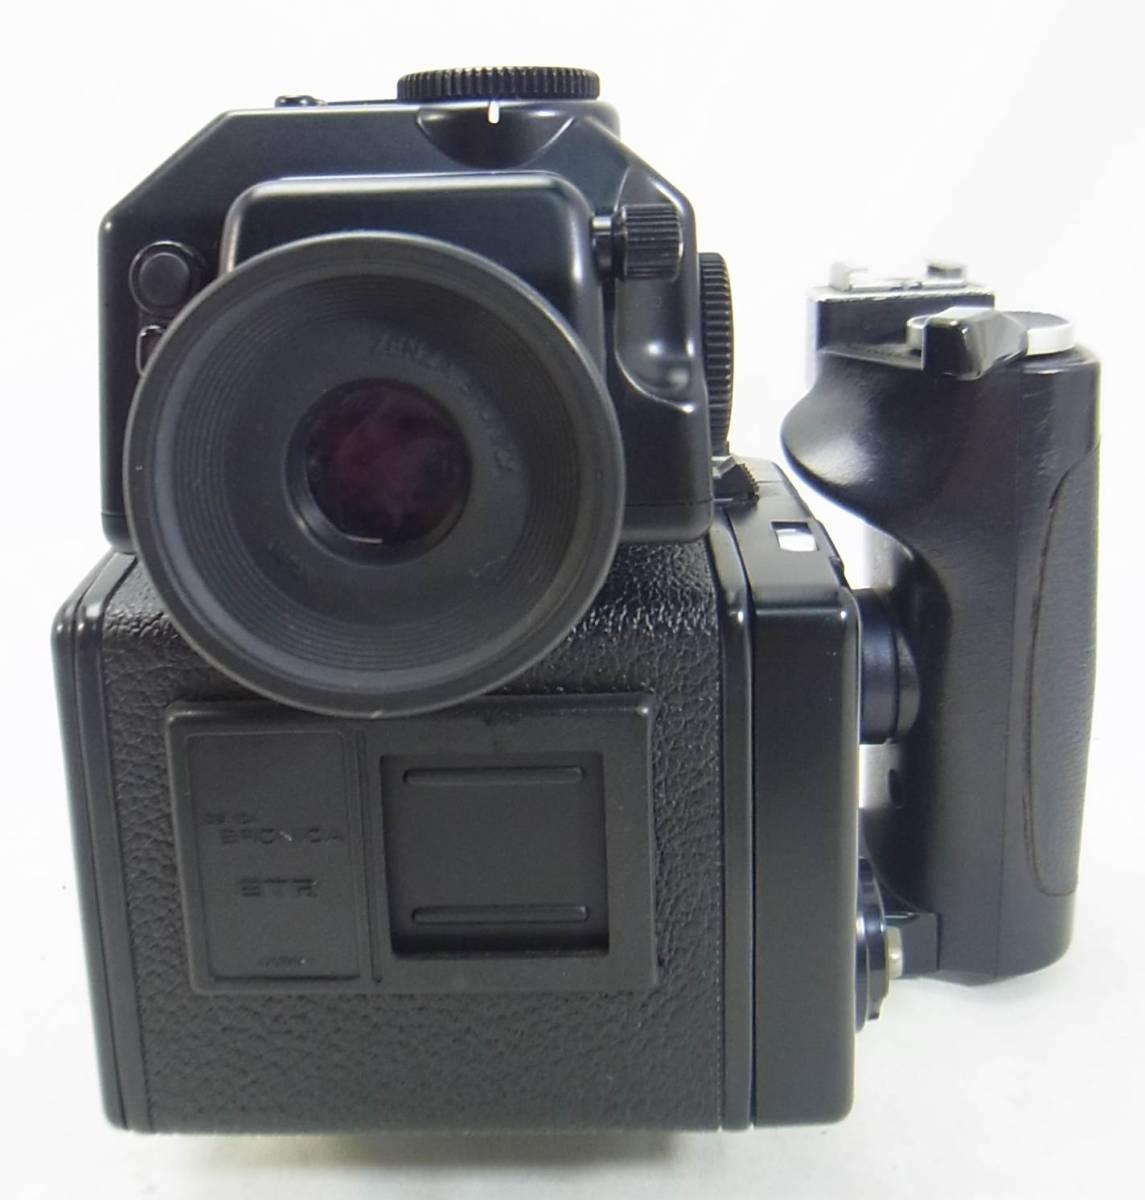 【ZENZA】ゼンザ☆BRONICA/ブロニカ☆ETR Si☆ZENZANON MC 1:2.8 f=75mm_画像6